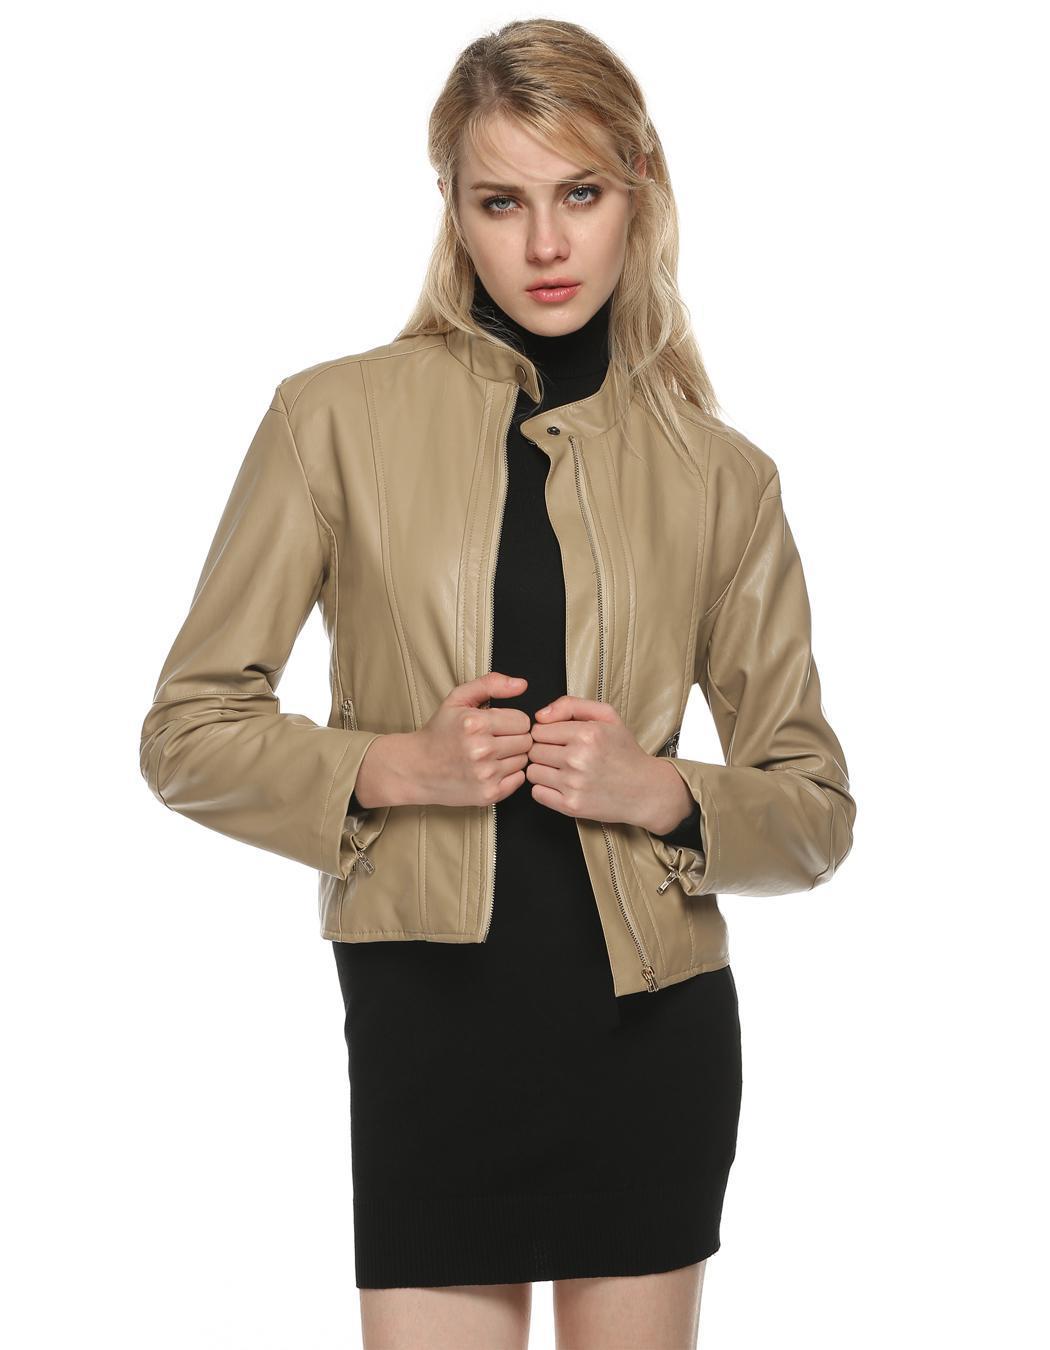 Women Long Sleeve Synthetic Leather Casual Bike Jacket Short Coat 0